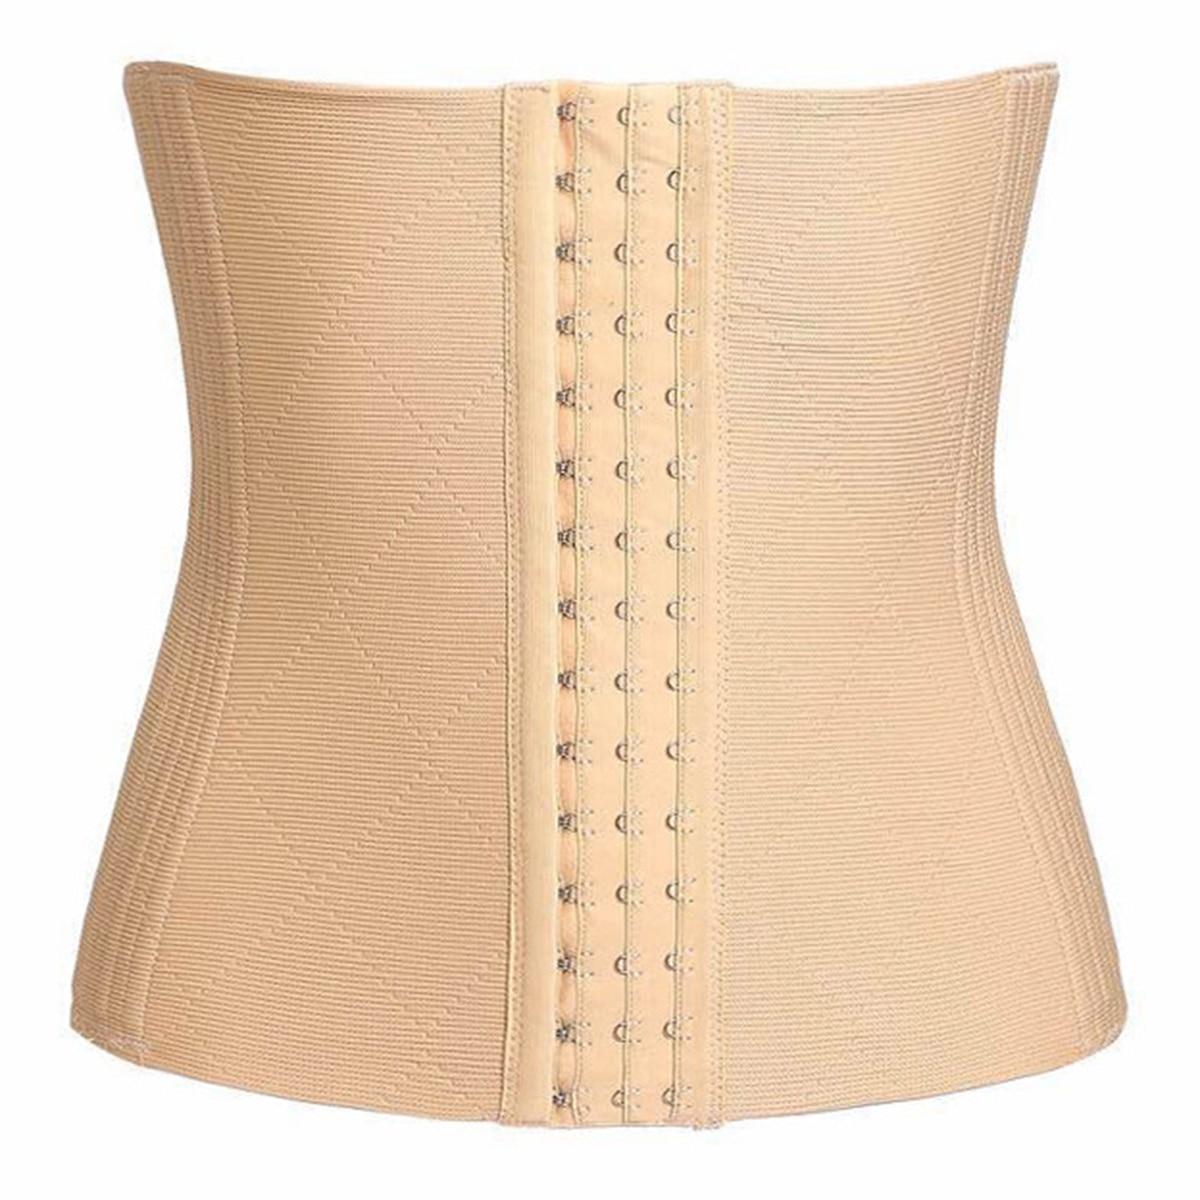 Nylon Waist Trainer Corset 16 Steel Bone Shapewear Body Shapers Women Corset Slimming Belt Waist Shaper Cinta Modeladora